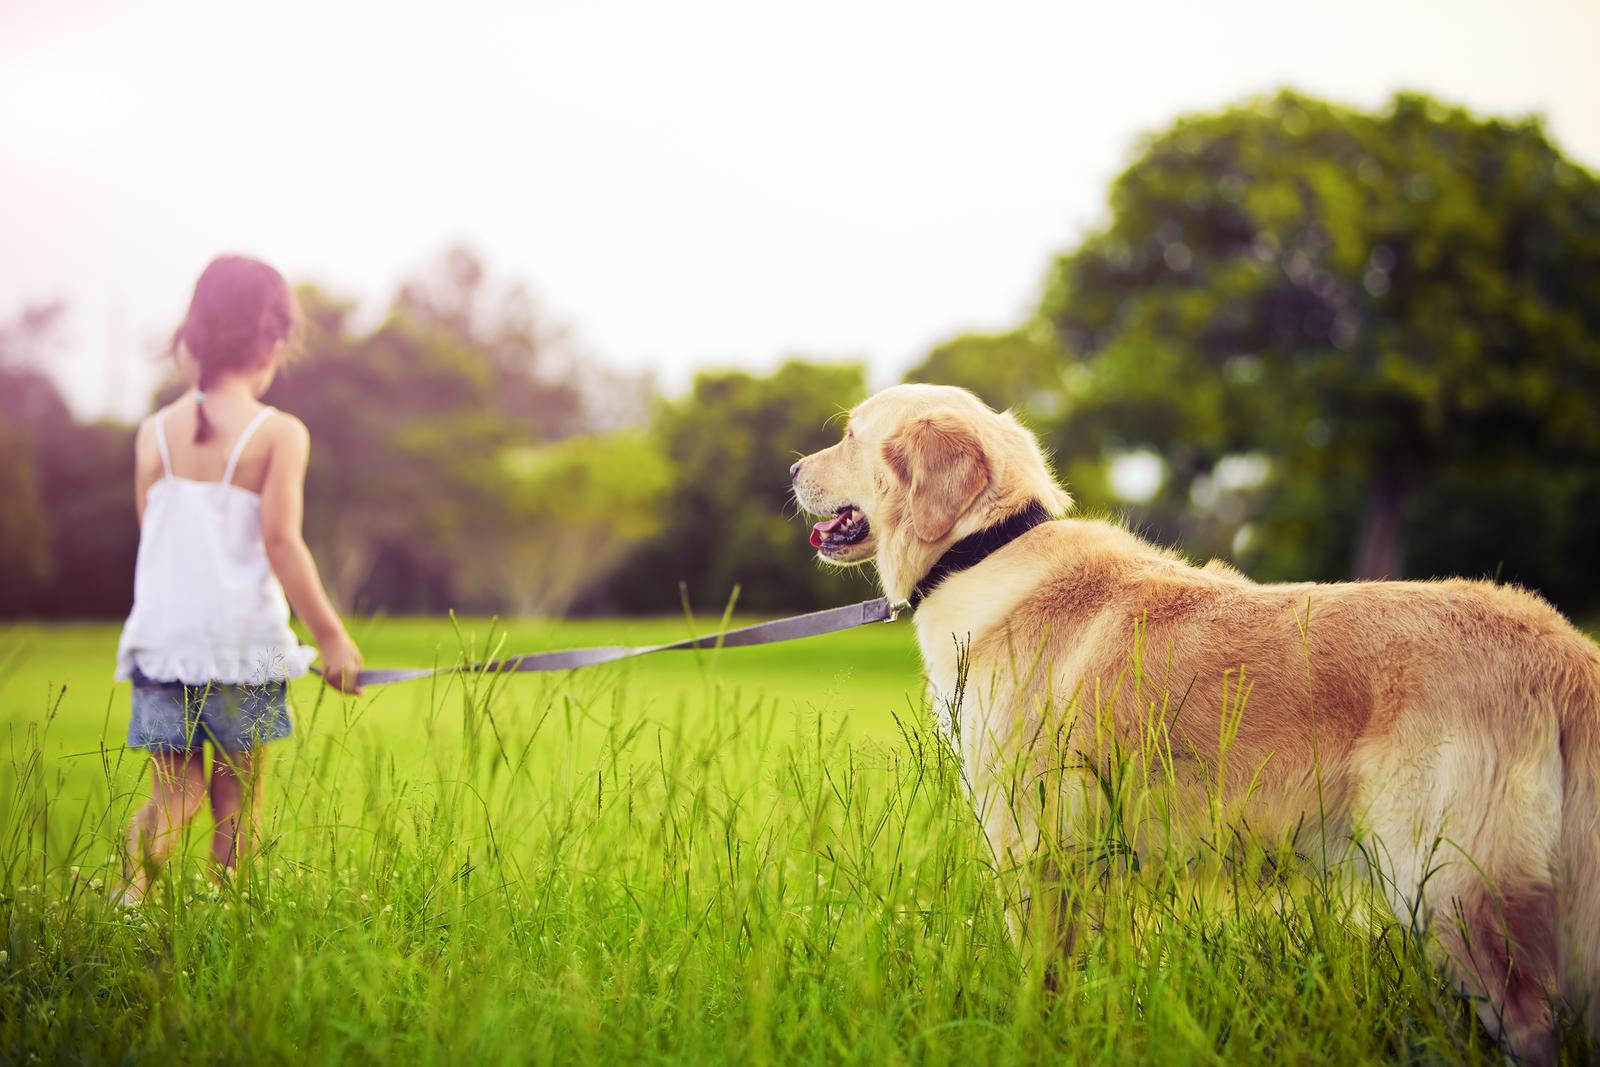 TVRH triangle veterinary referral hospital trianglevrh bigstock-Young-girl-with-golden-retriev-19404545.jpg